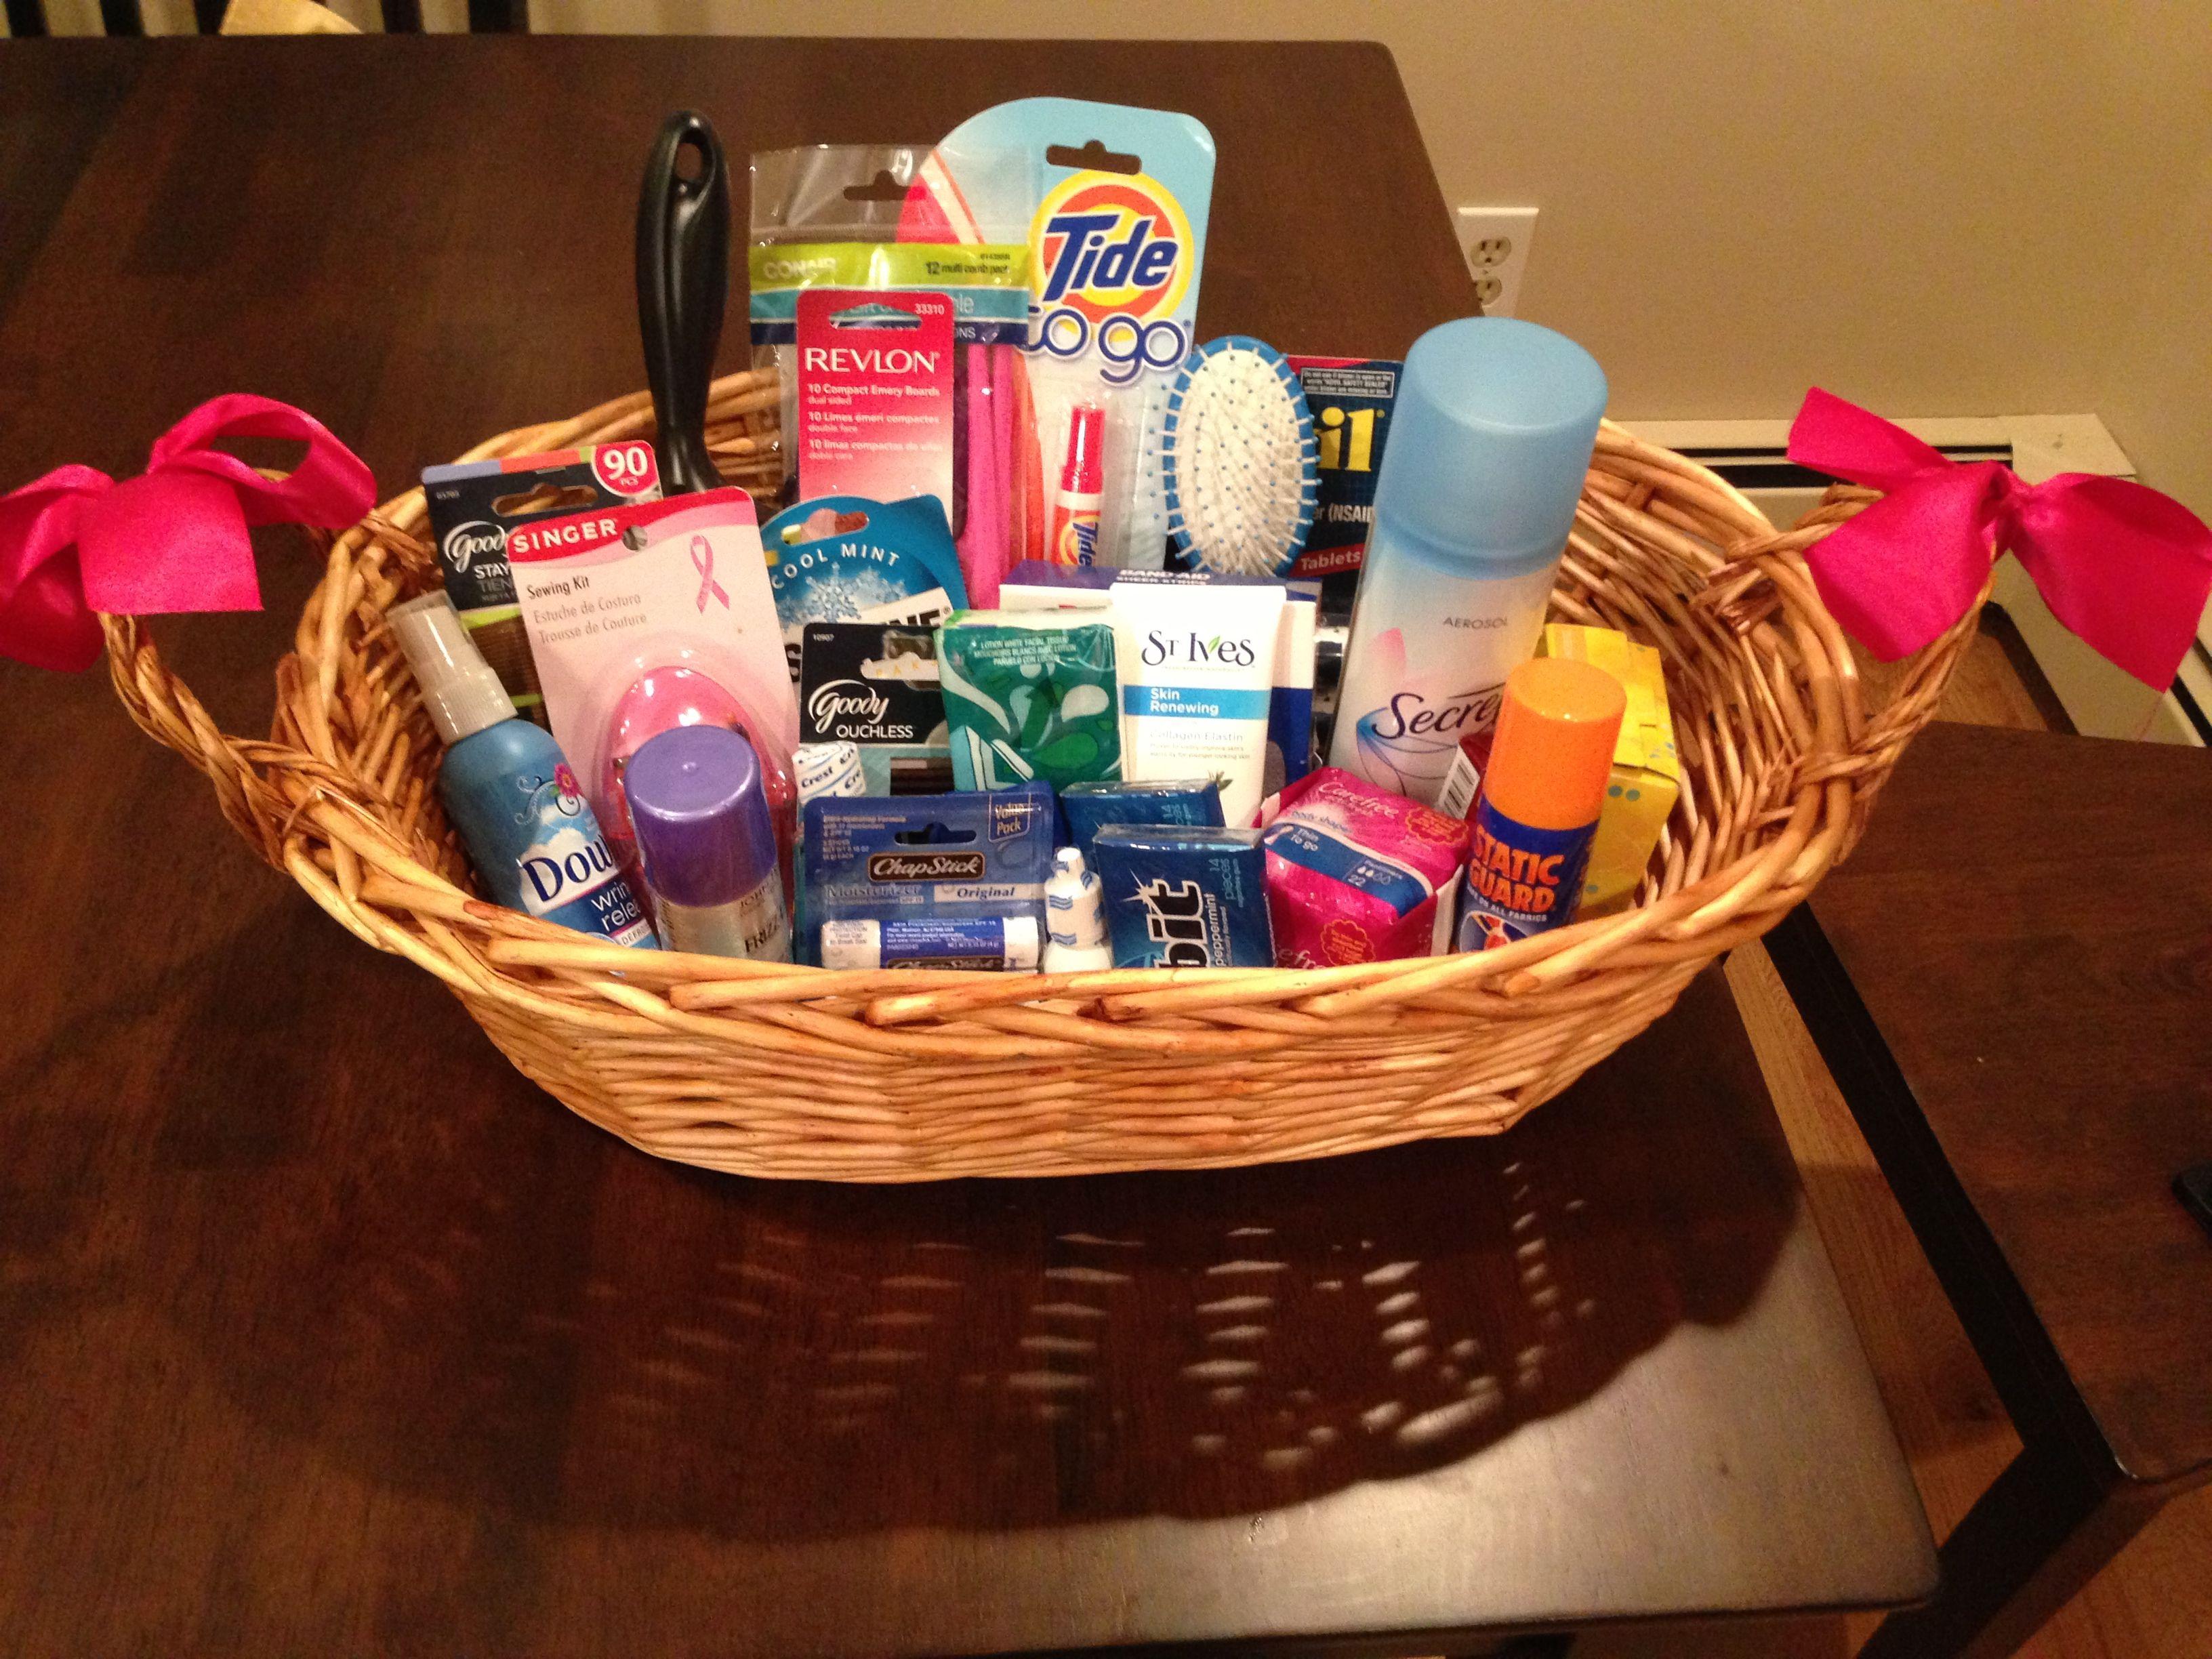 20 Wedding Bathroom Basket Magzhouse, What To Put In Bathroom Baskets